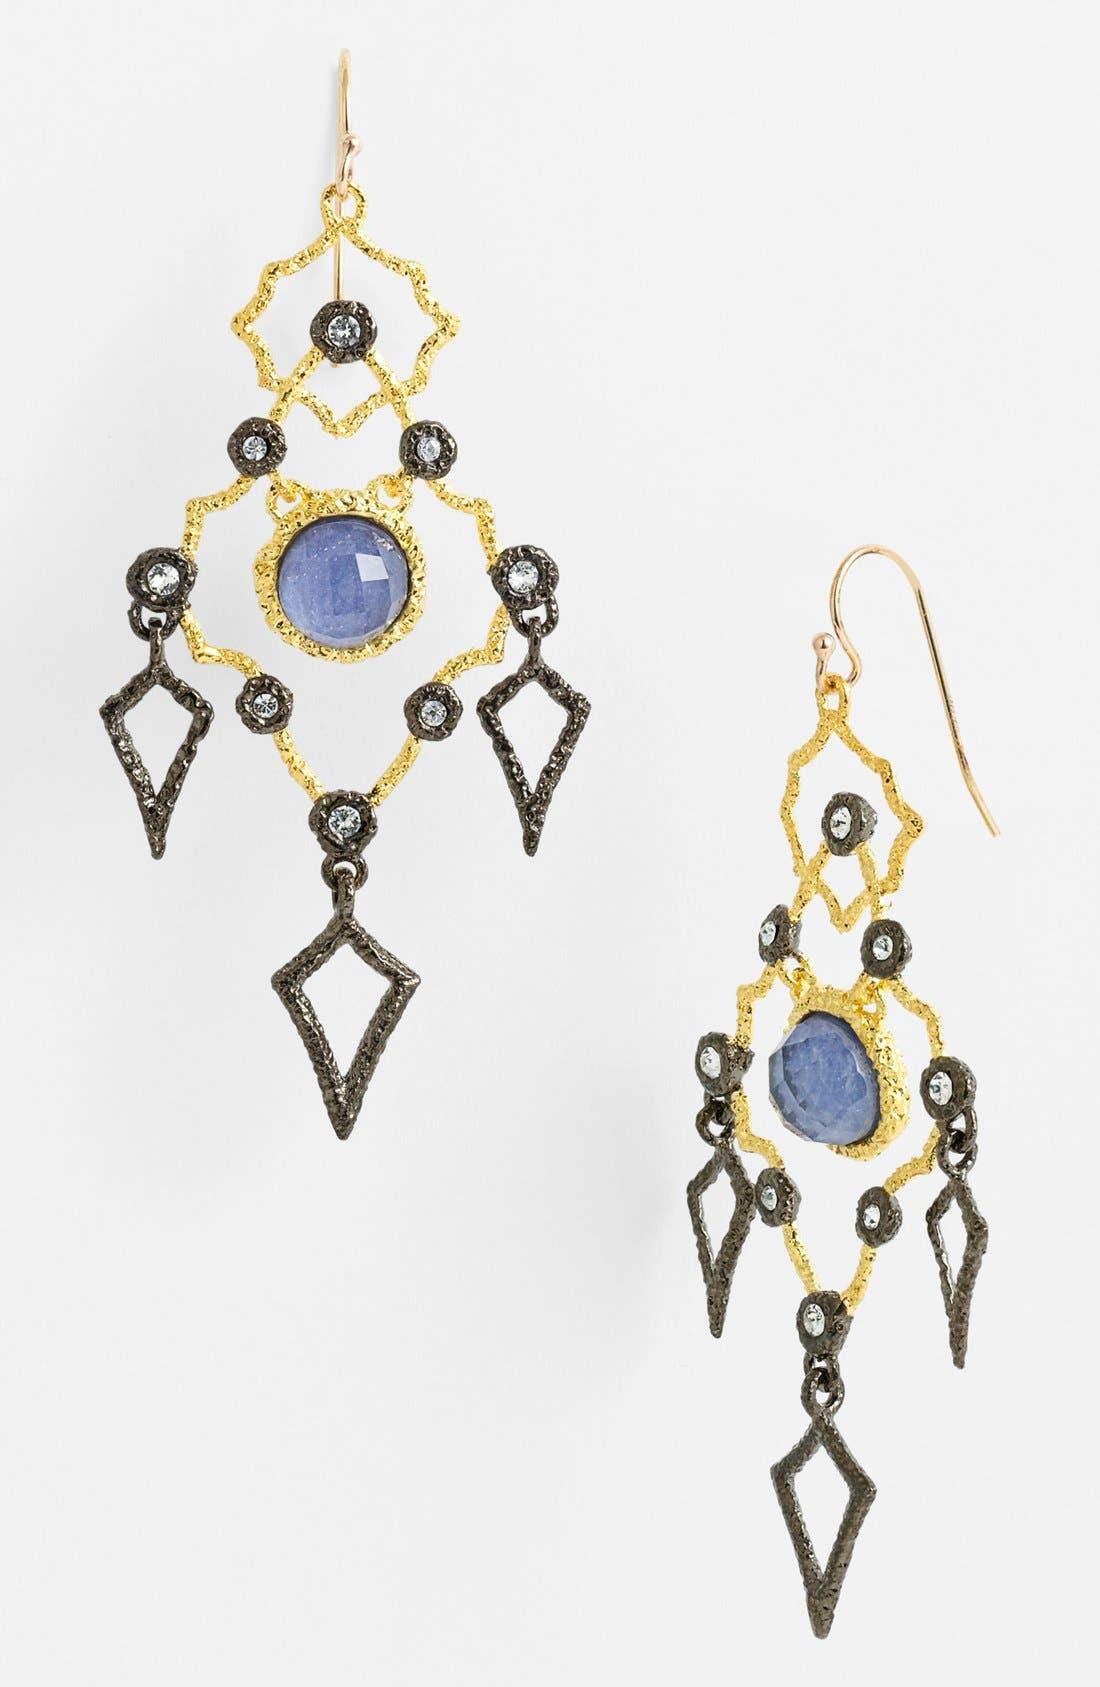 Alternate Image 1 Selected - Alexis Bittar 'Elements - Jardin de Papillon' Chandelier Earrings